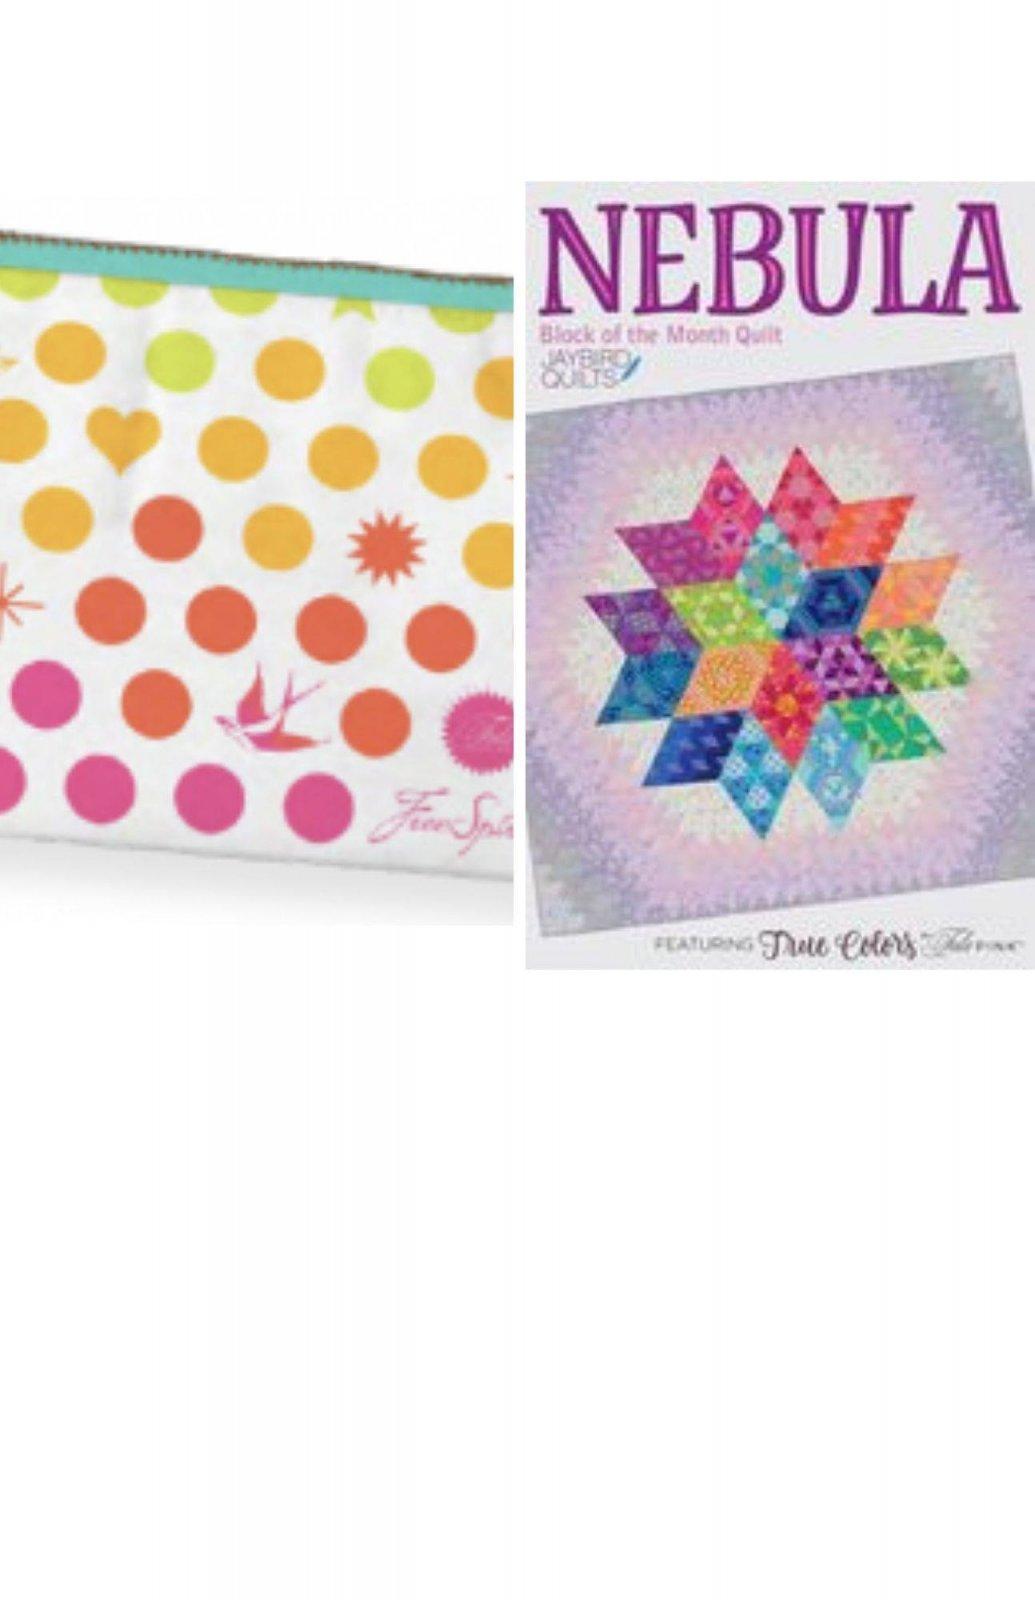 Nebula BOM includes SWAG! Kit 3